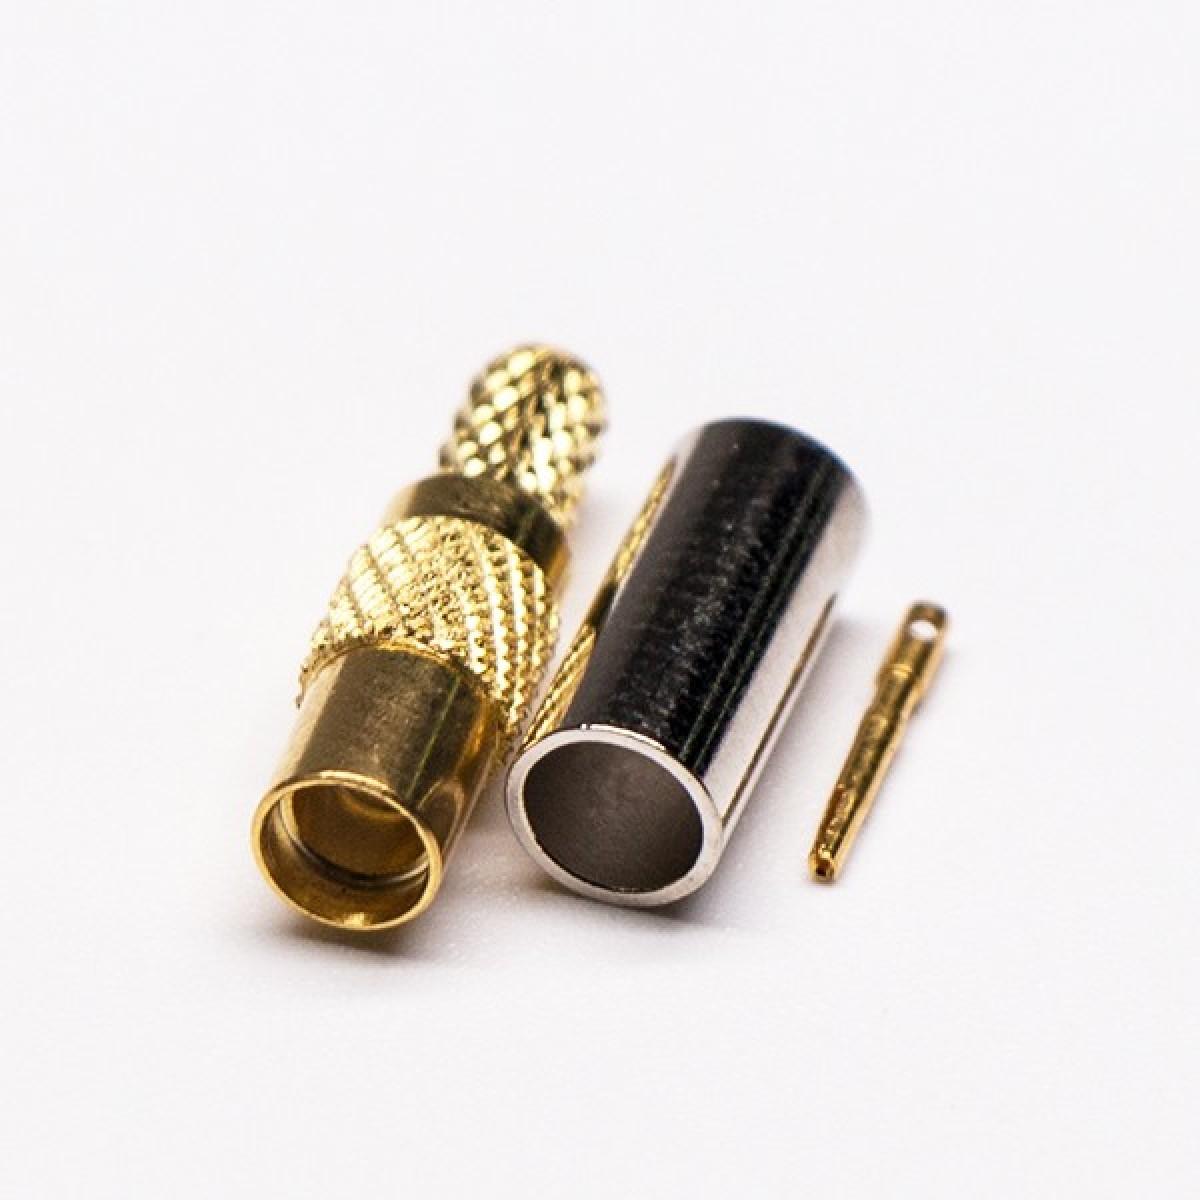 MMCX同轴连接器直式公头压接式接同轴线缆